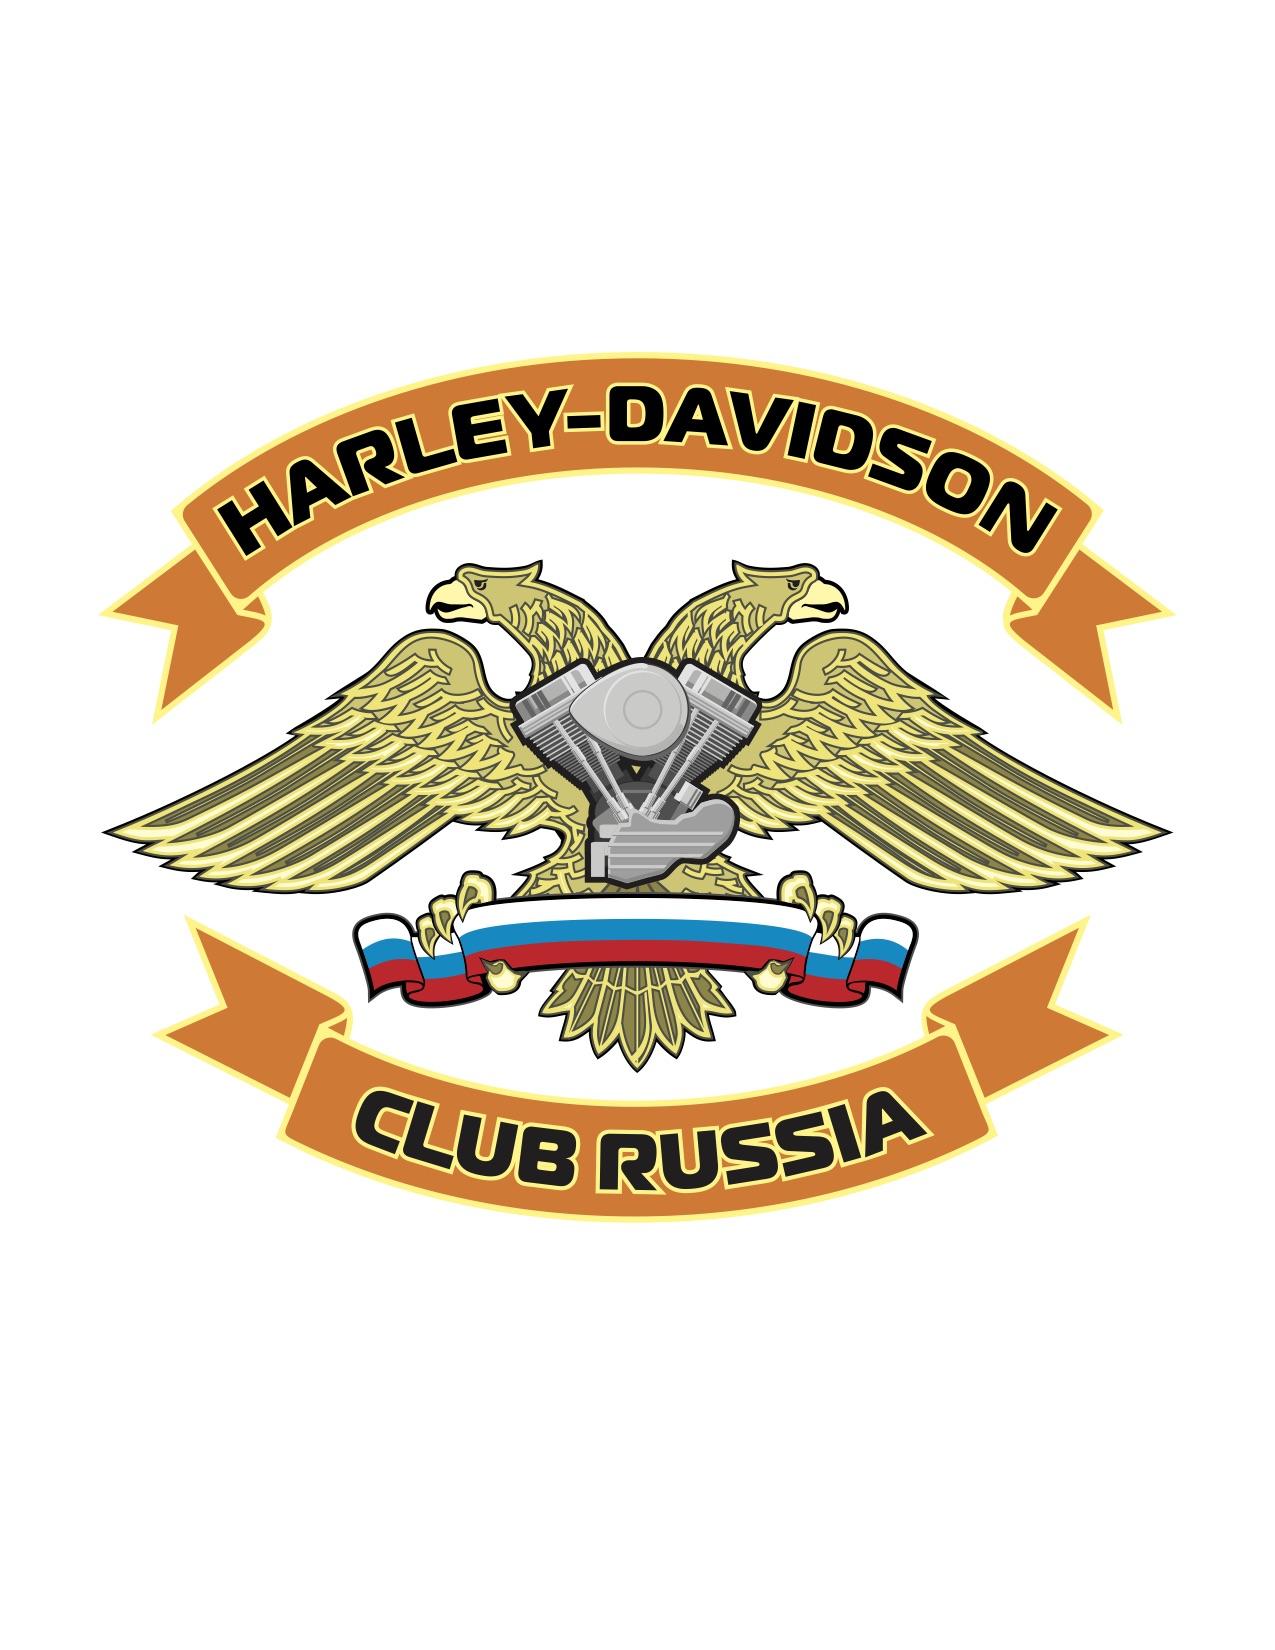 «Harley-Davidson Club Russia» (H-DCR)